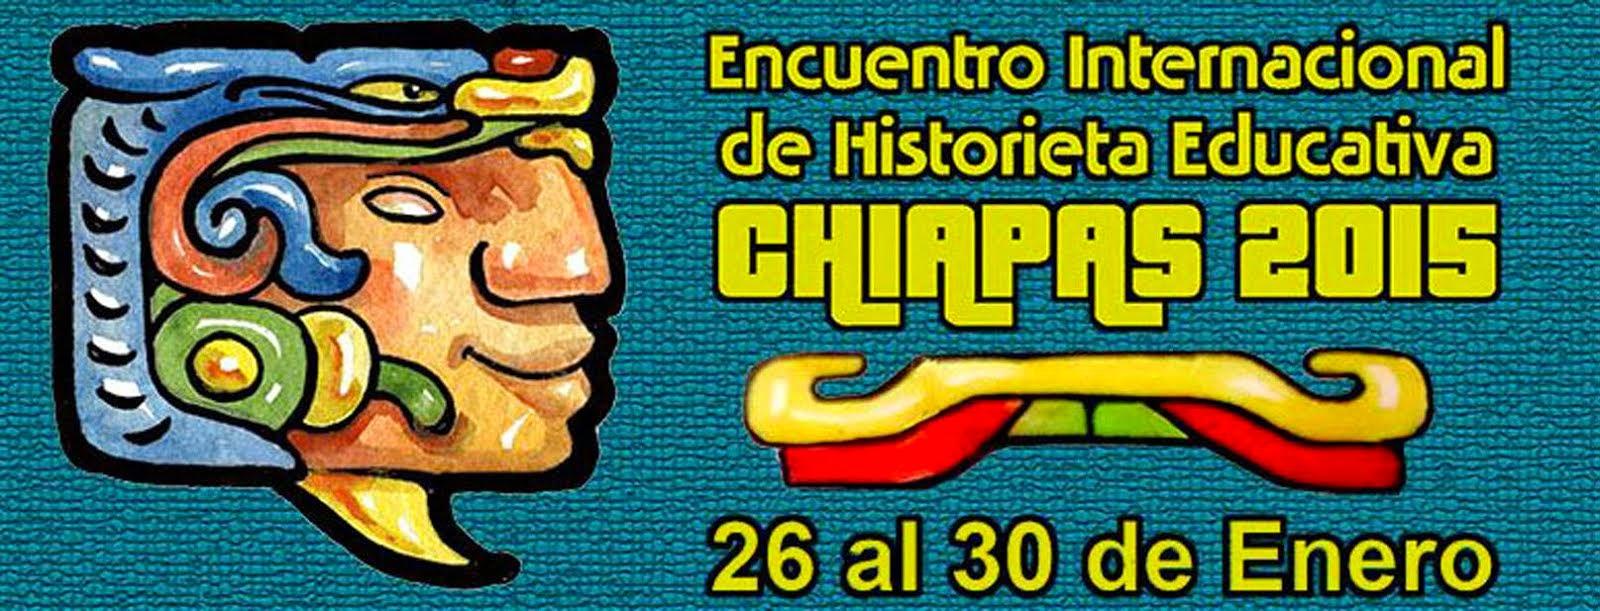 Encuentro Internacional de Historieta Educativa Chiapas 2015